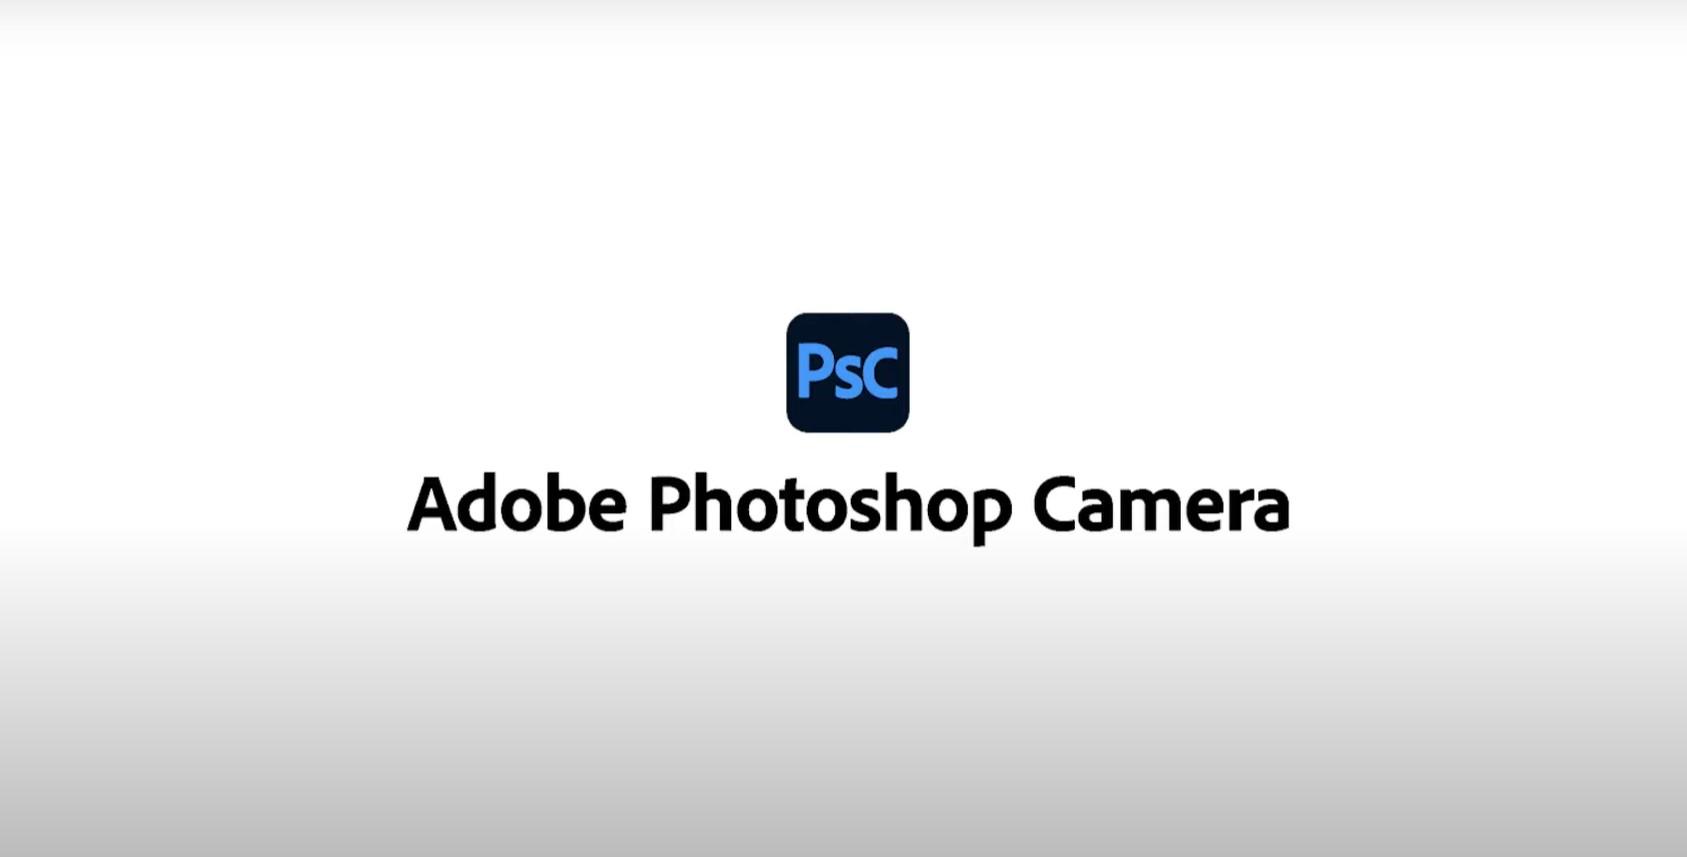 Adobe Photoshop Camera APK download